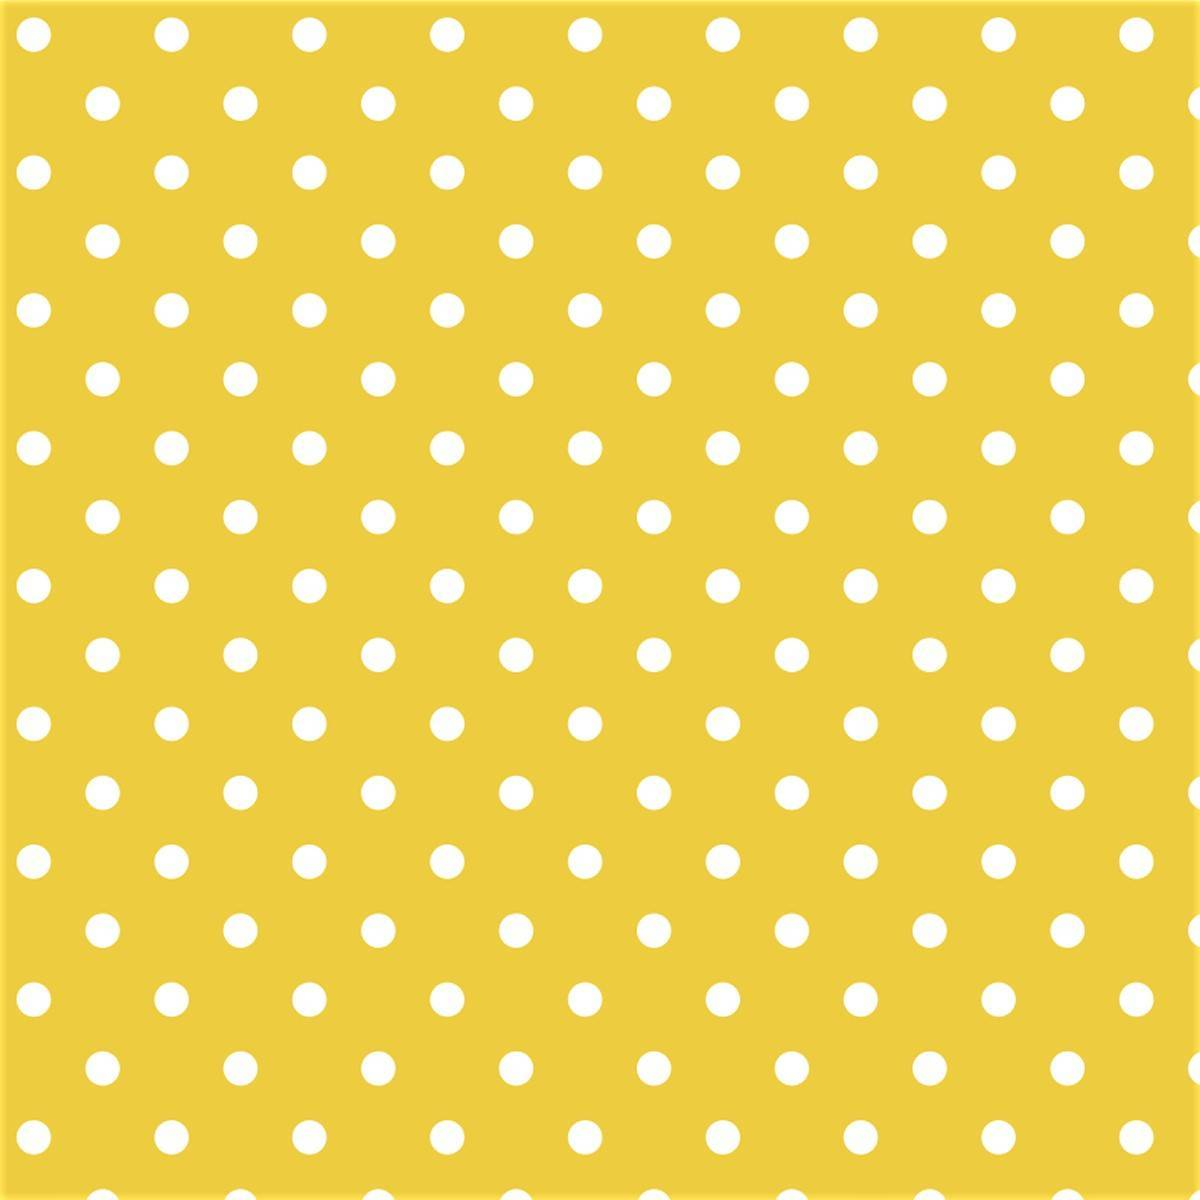 Poá Amarelo - Ref. 1001 cor 134 - Peripan - Armarinhos Nodari